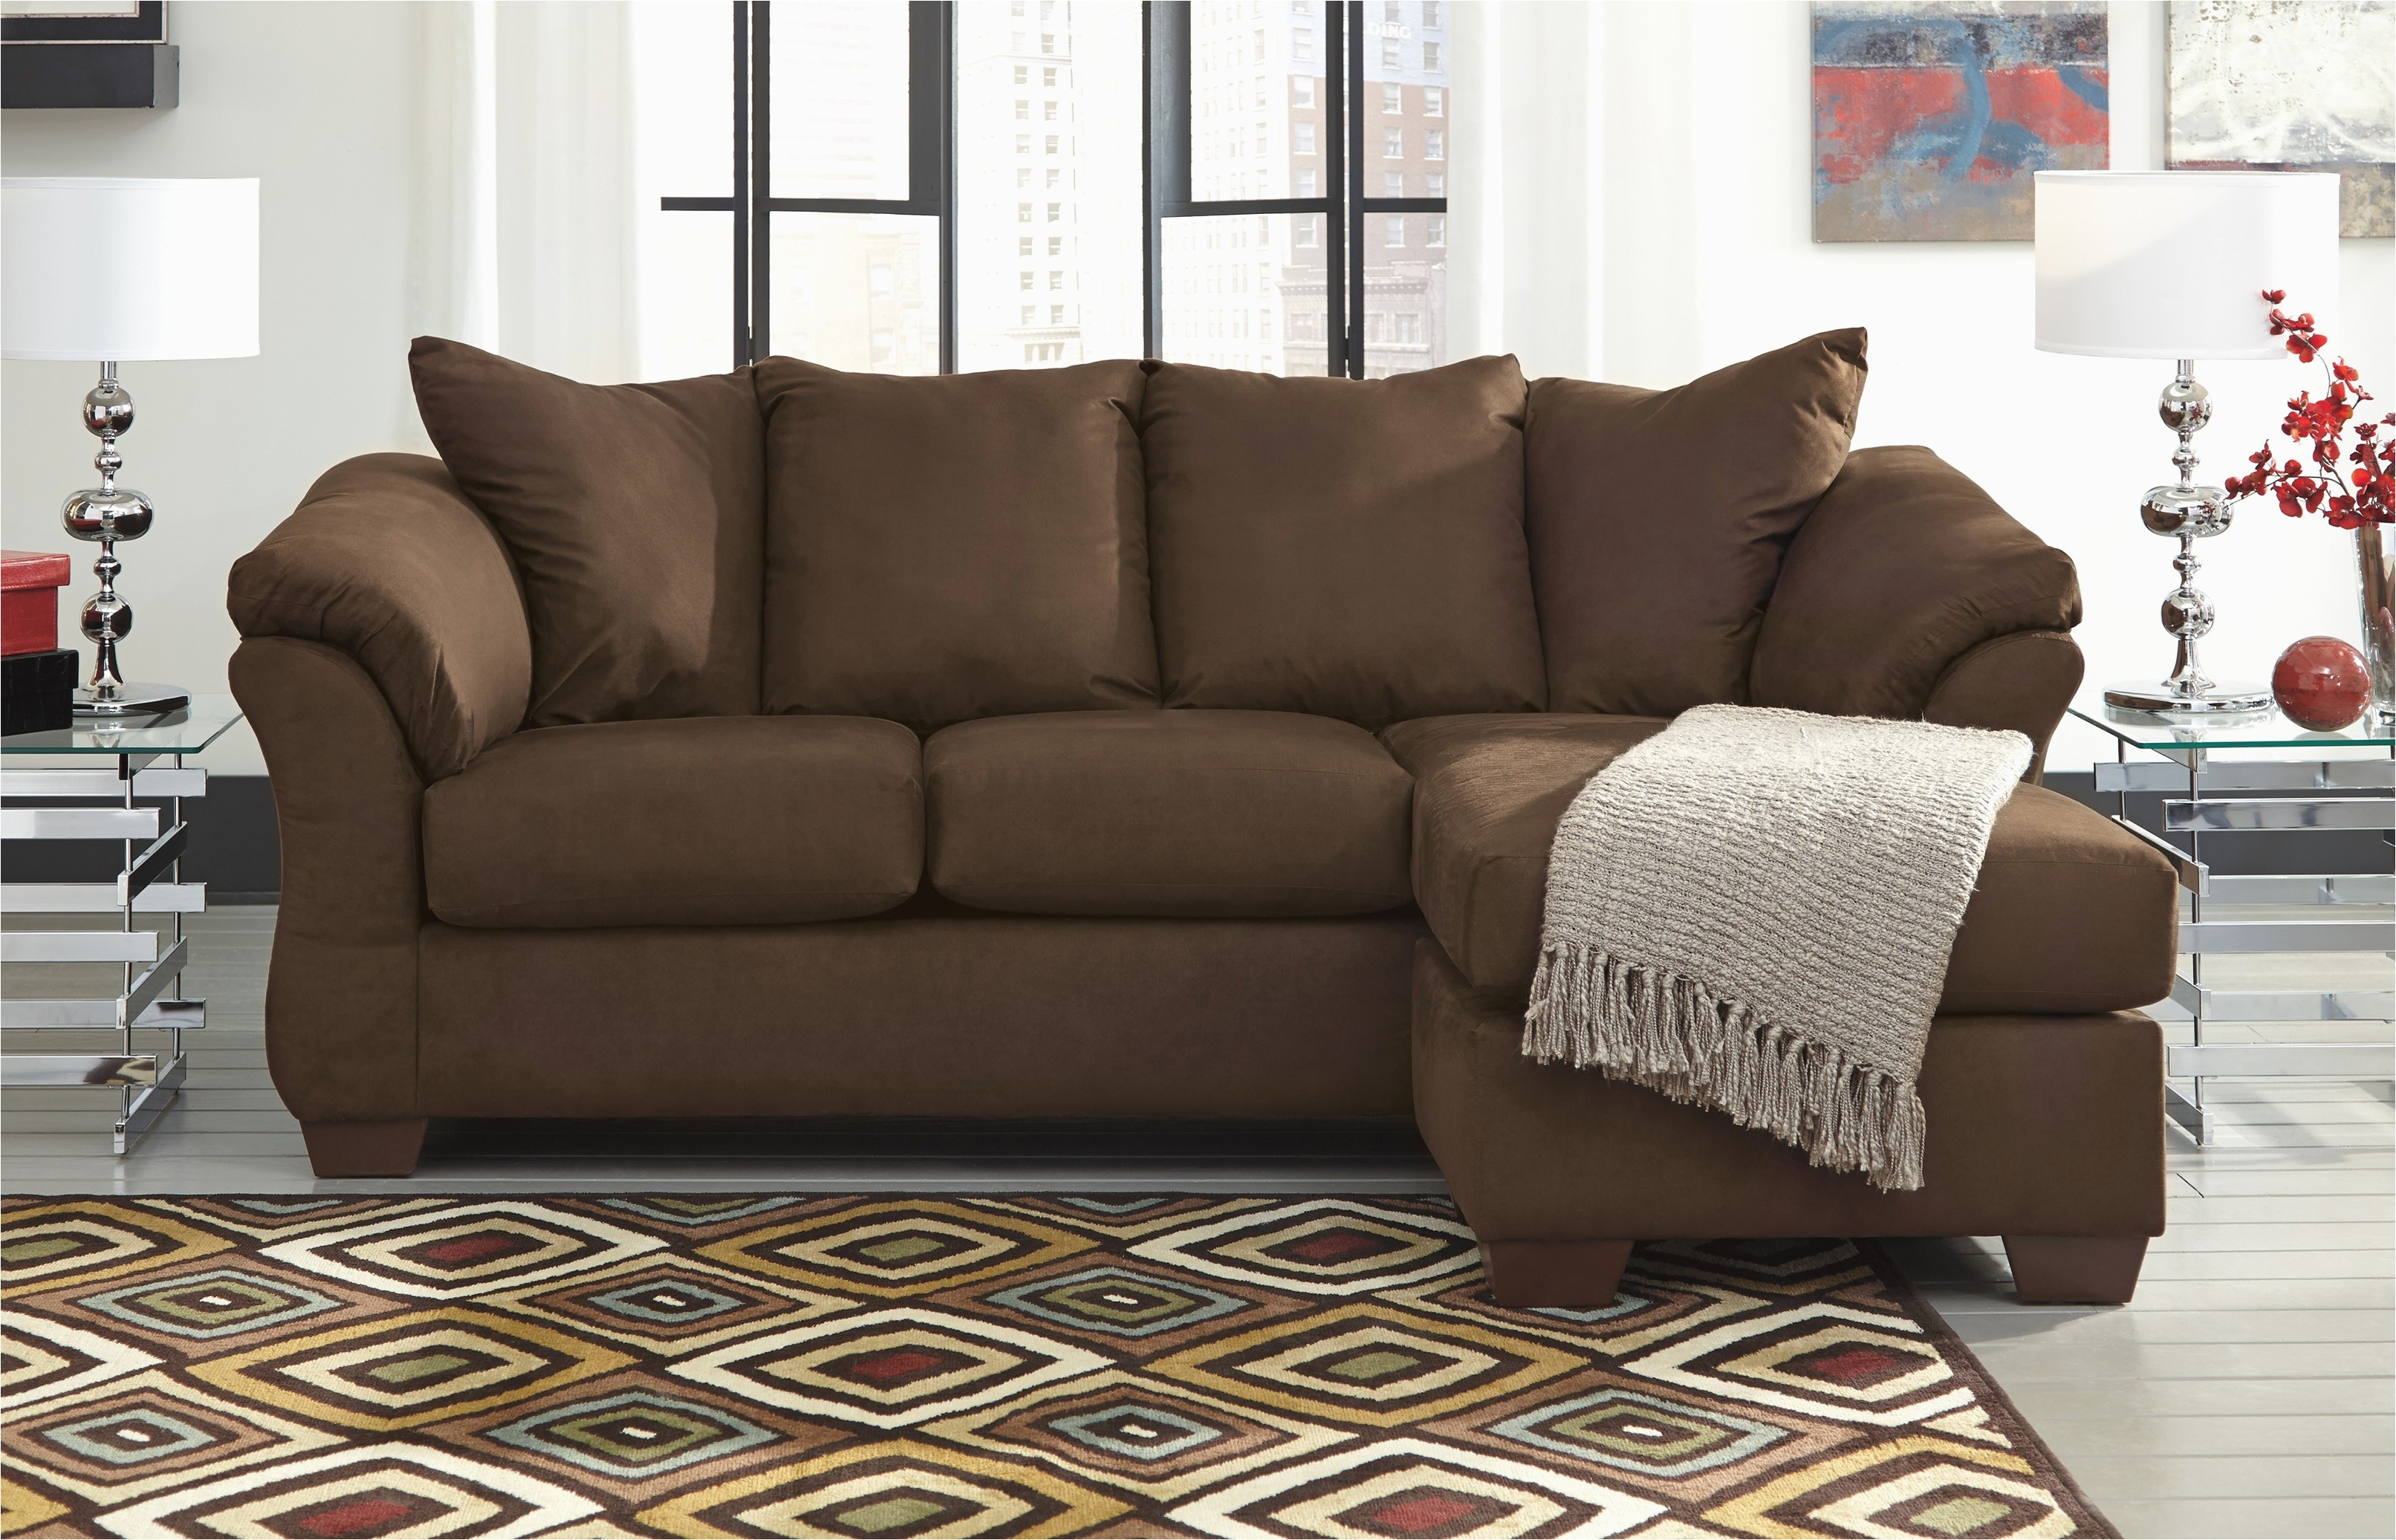 ashley furniture couch slipcovers sofas ashley furniture chaise sofa signature design by ashley ashley furniture